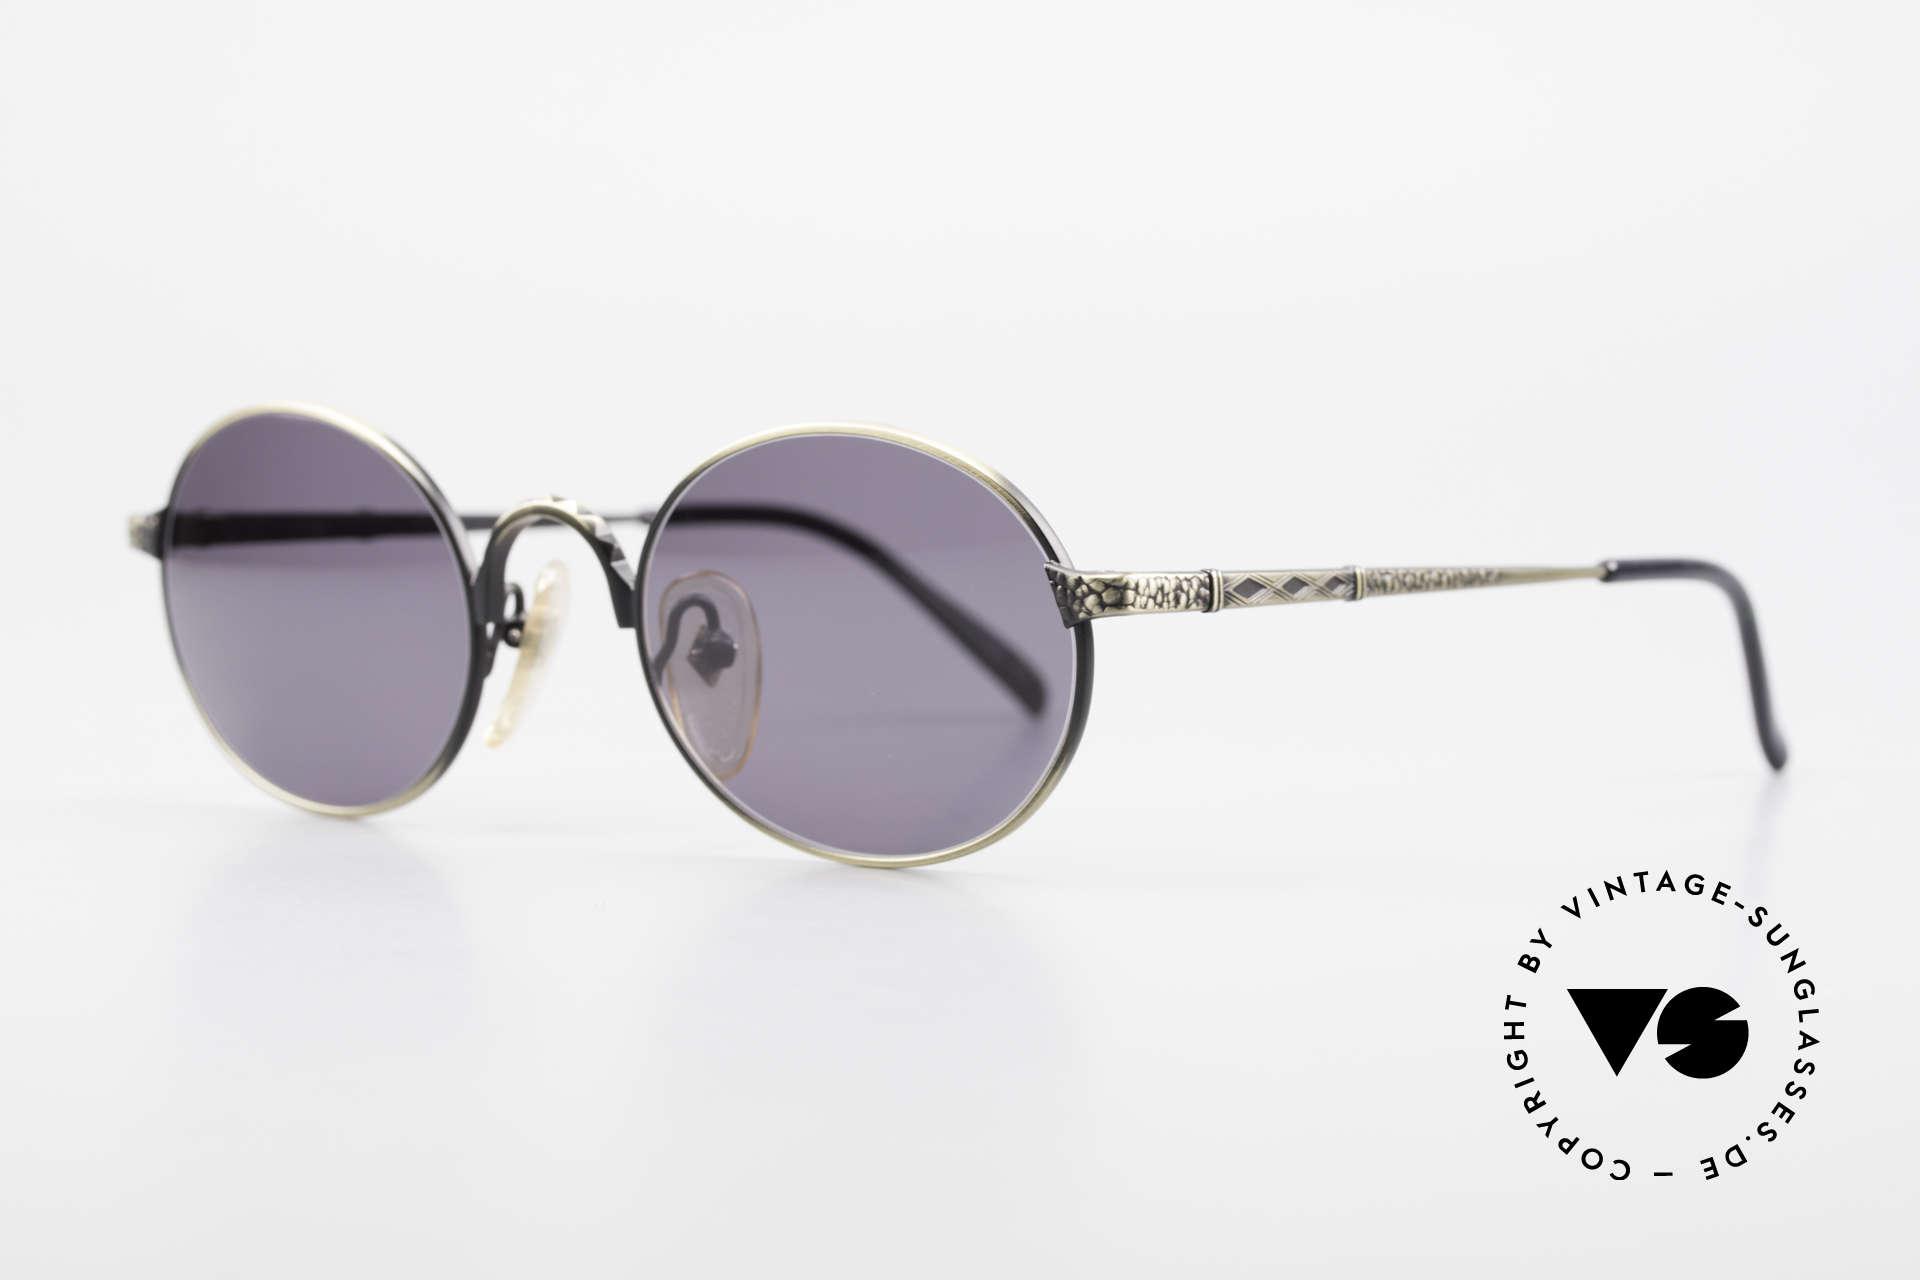 Jean Paul Gaultier 55-9672 Oval 1990's JPG Sunglasses, 'smoke gold' finish and dark-gray sun lenses, Made for Men and Women